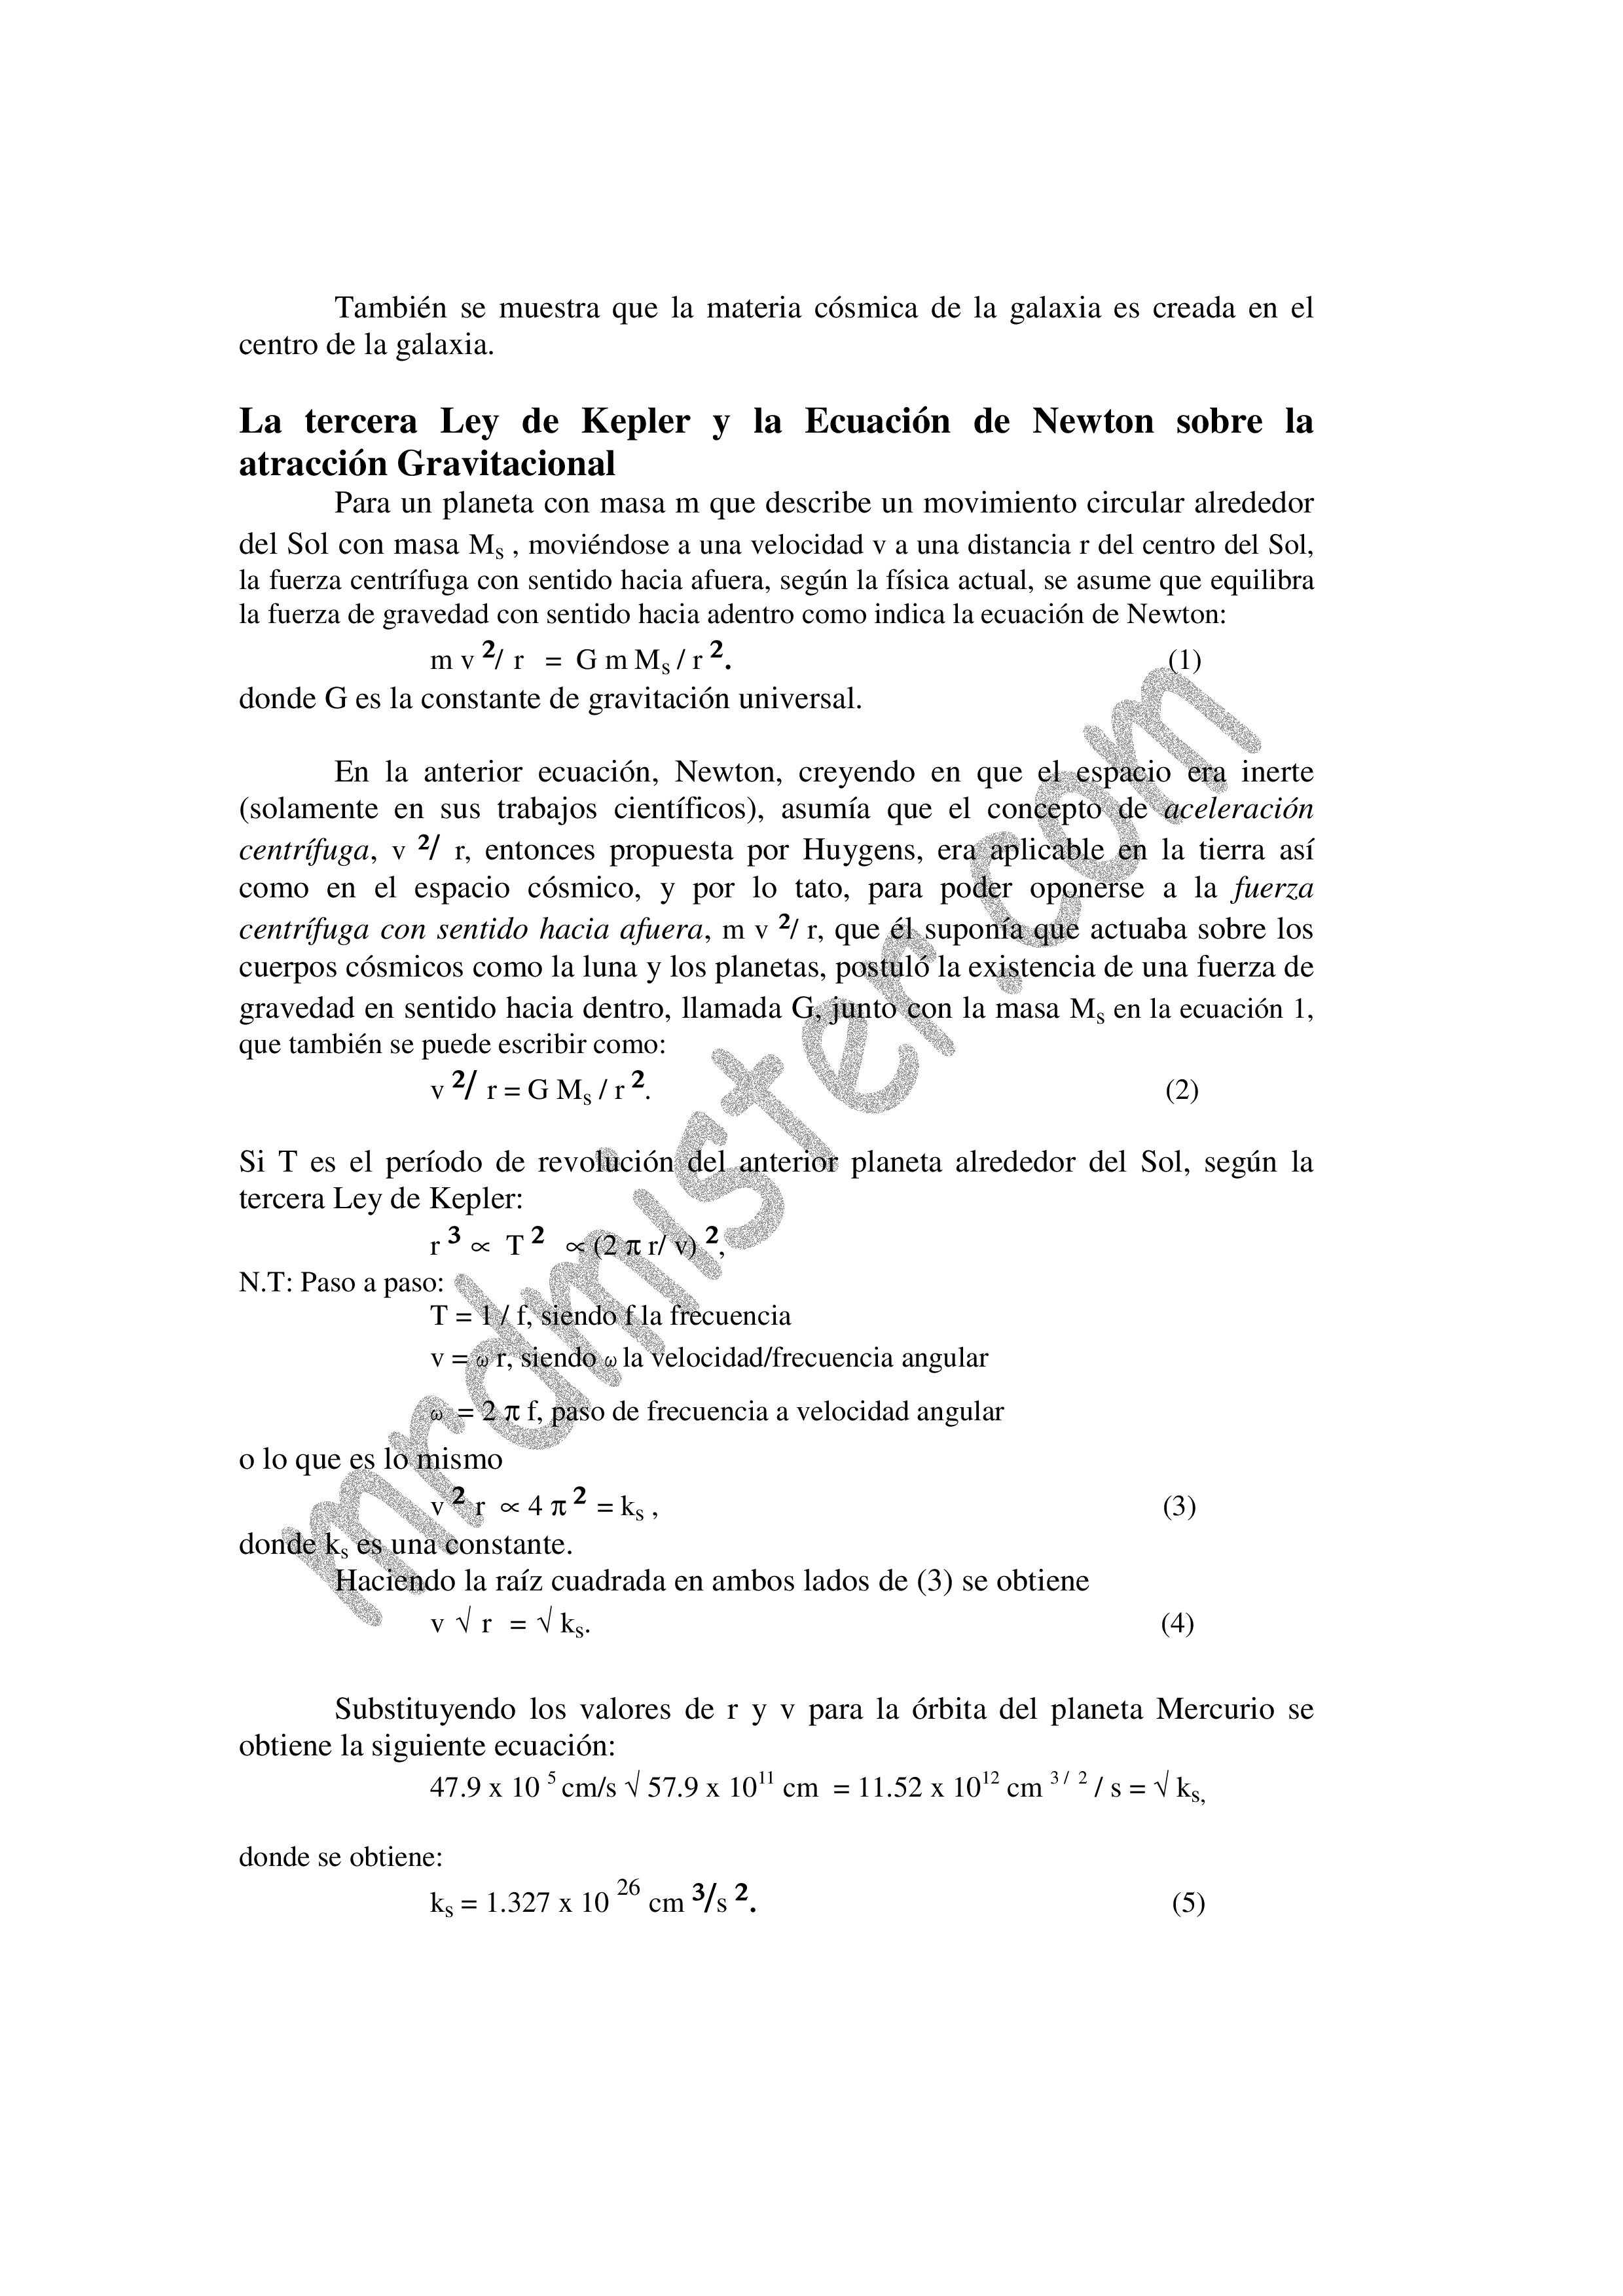 Documento2_Tewari_Espanol_con_dibujos-3